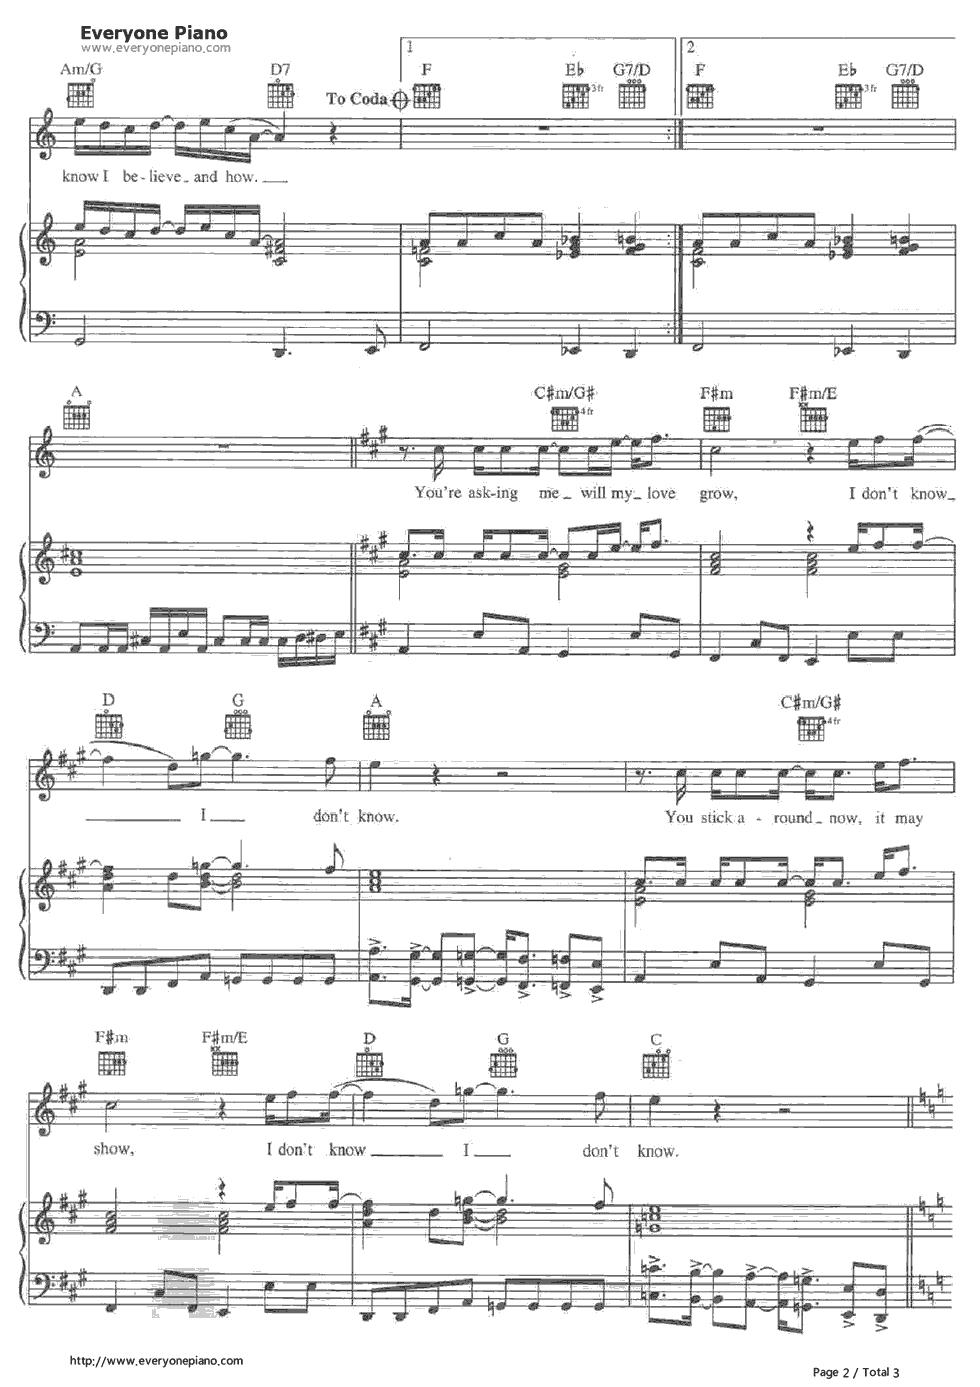 钢琴曲谱 流行 something-the beatles something-the beatles五线谱